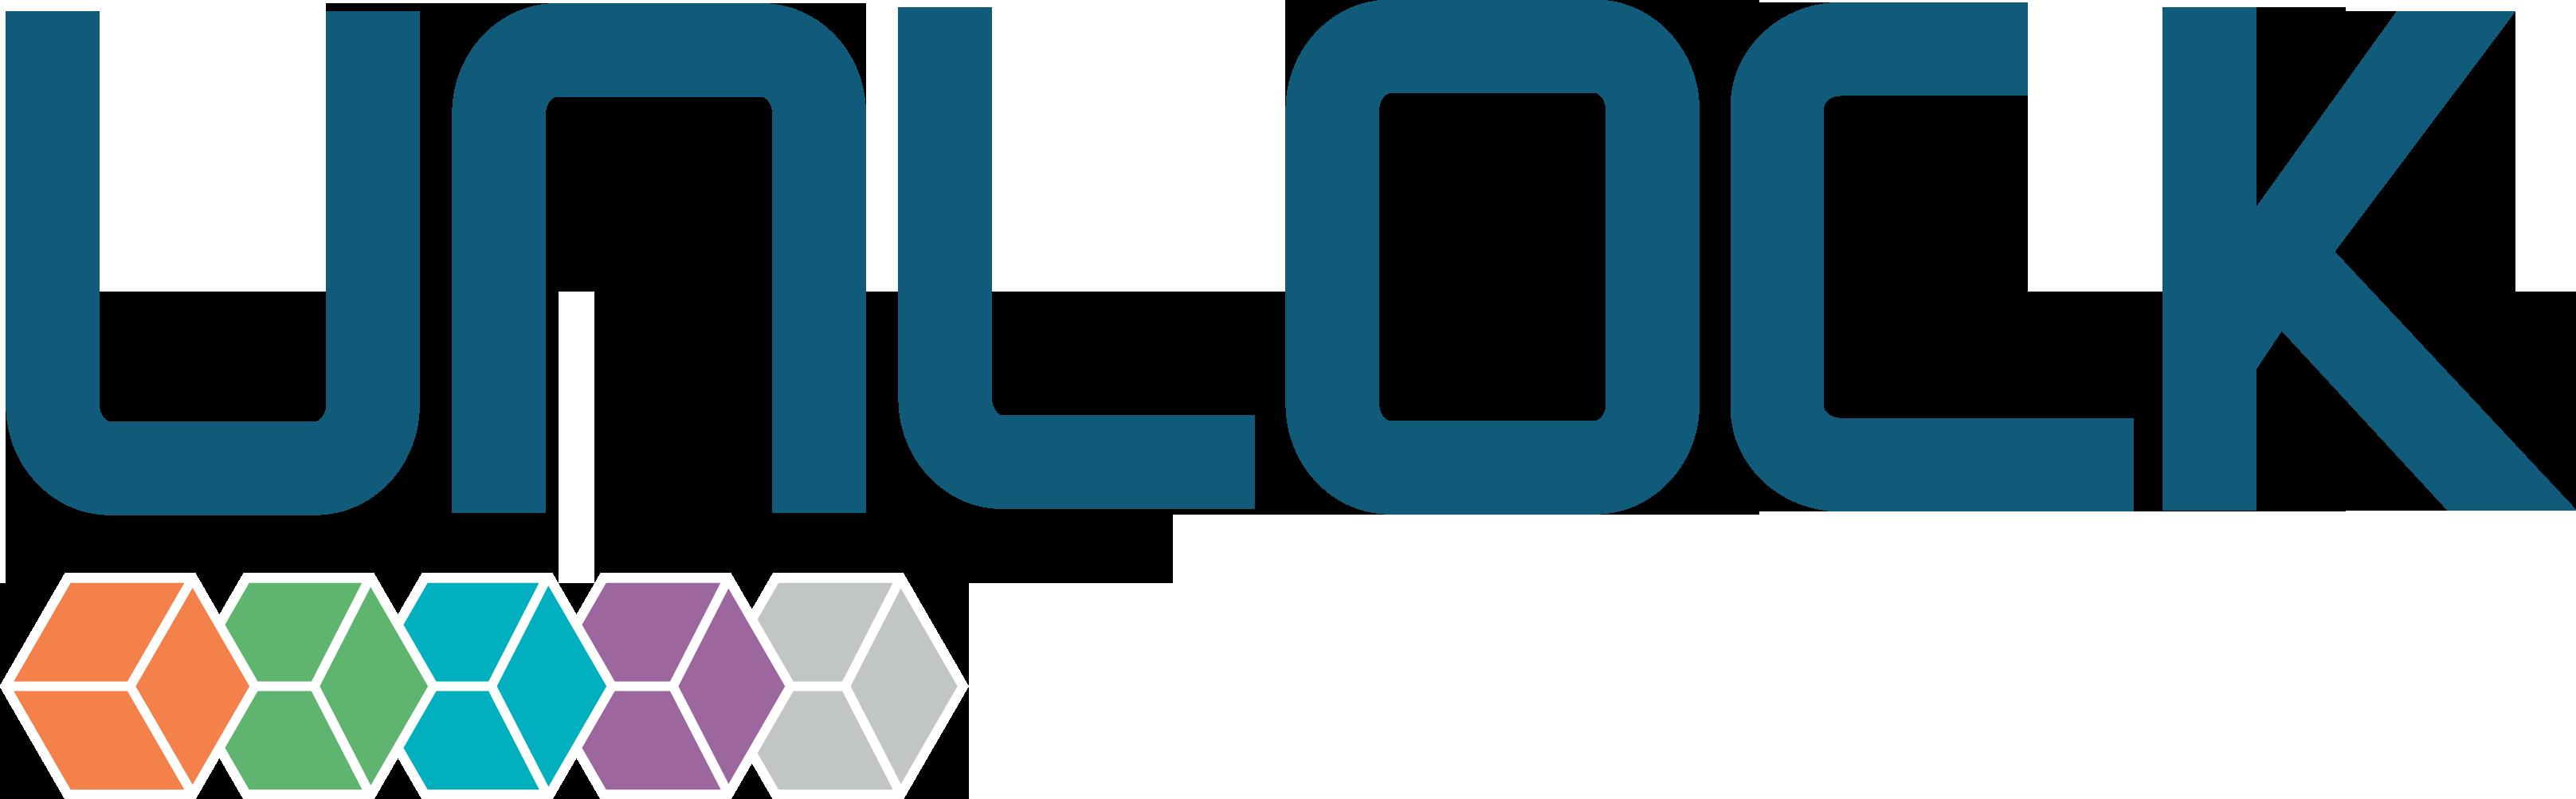 UNLOCK-logo-new_0